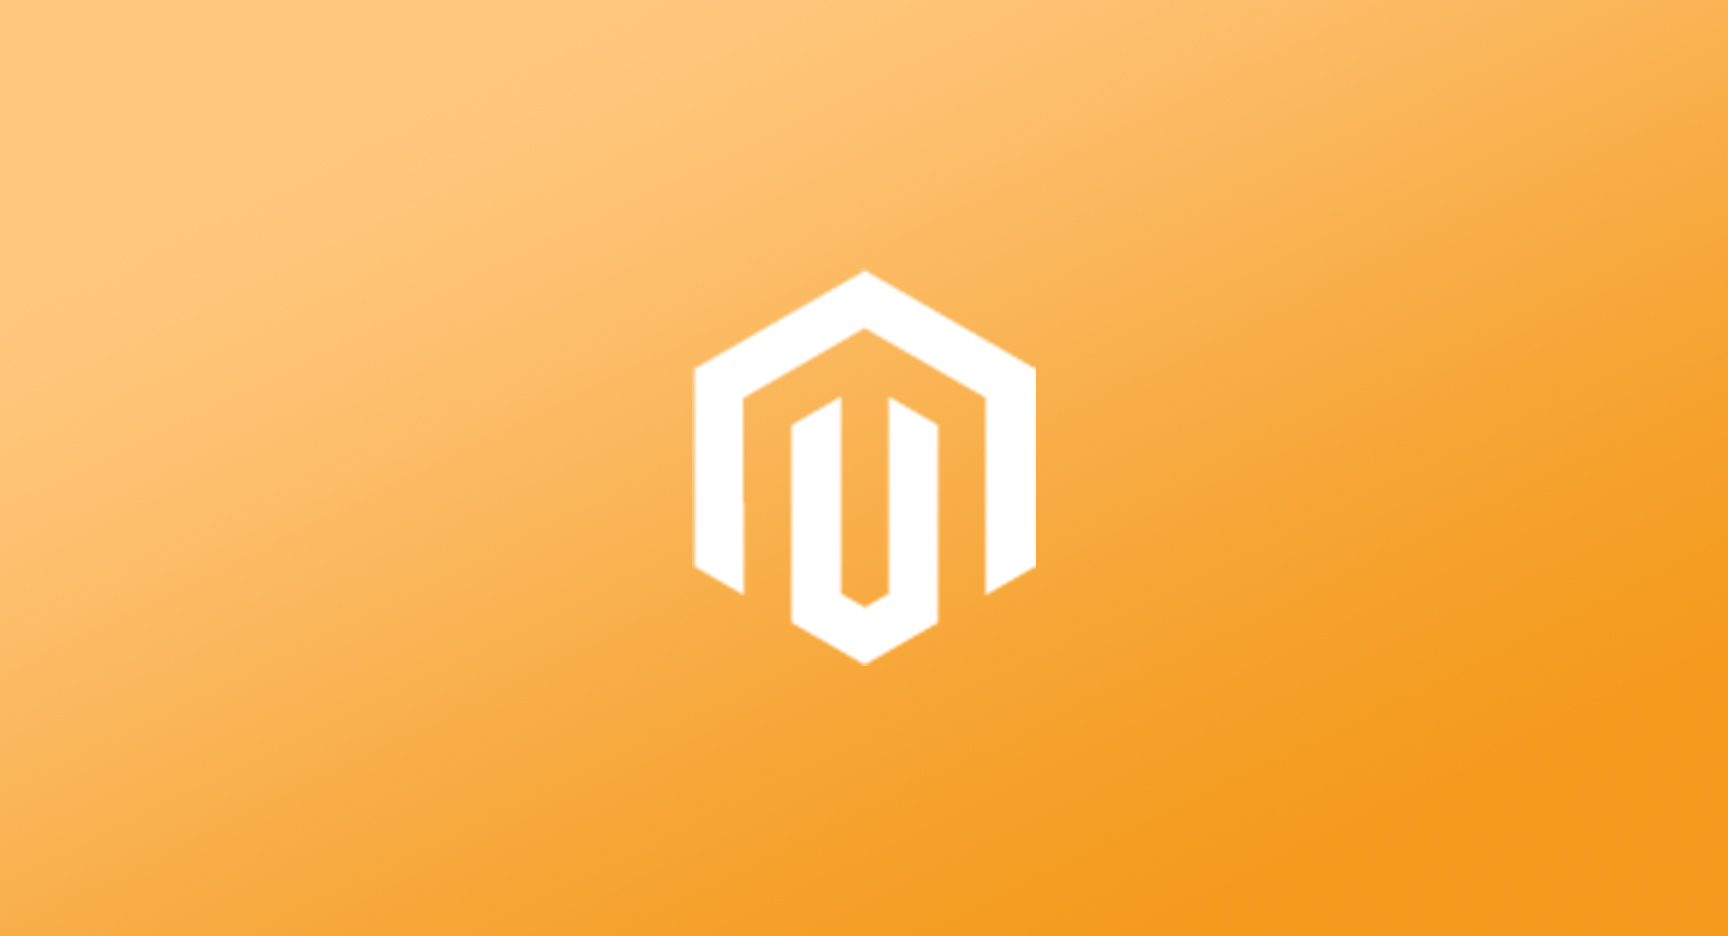 magento community or magento enterprise